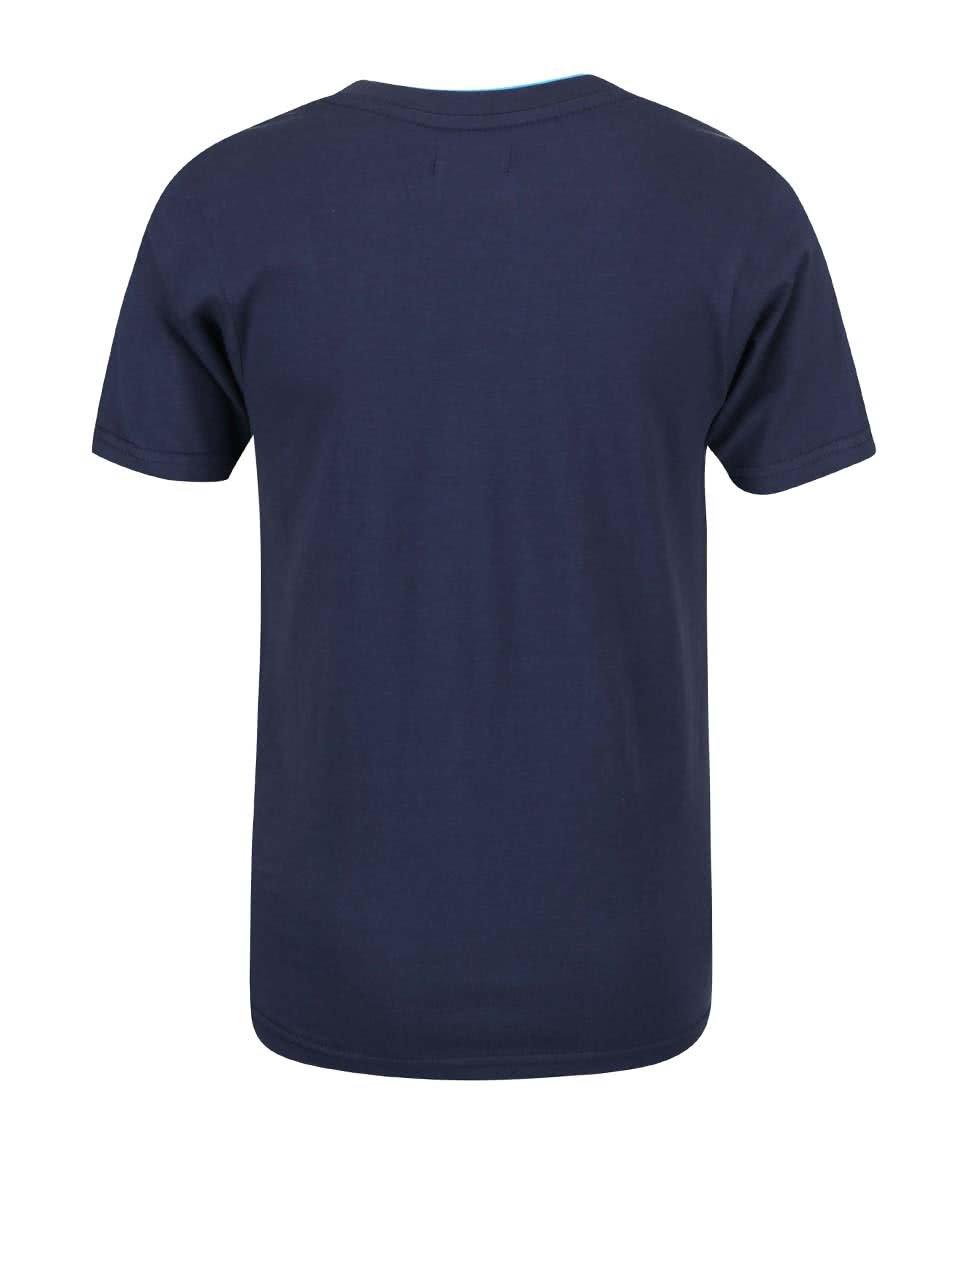 8a24ebd0653b Modré detské tričko s potlačou káblov Blue Seven ...